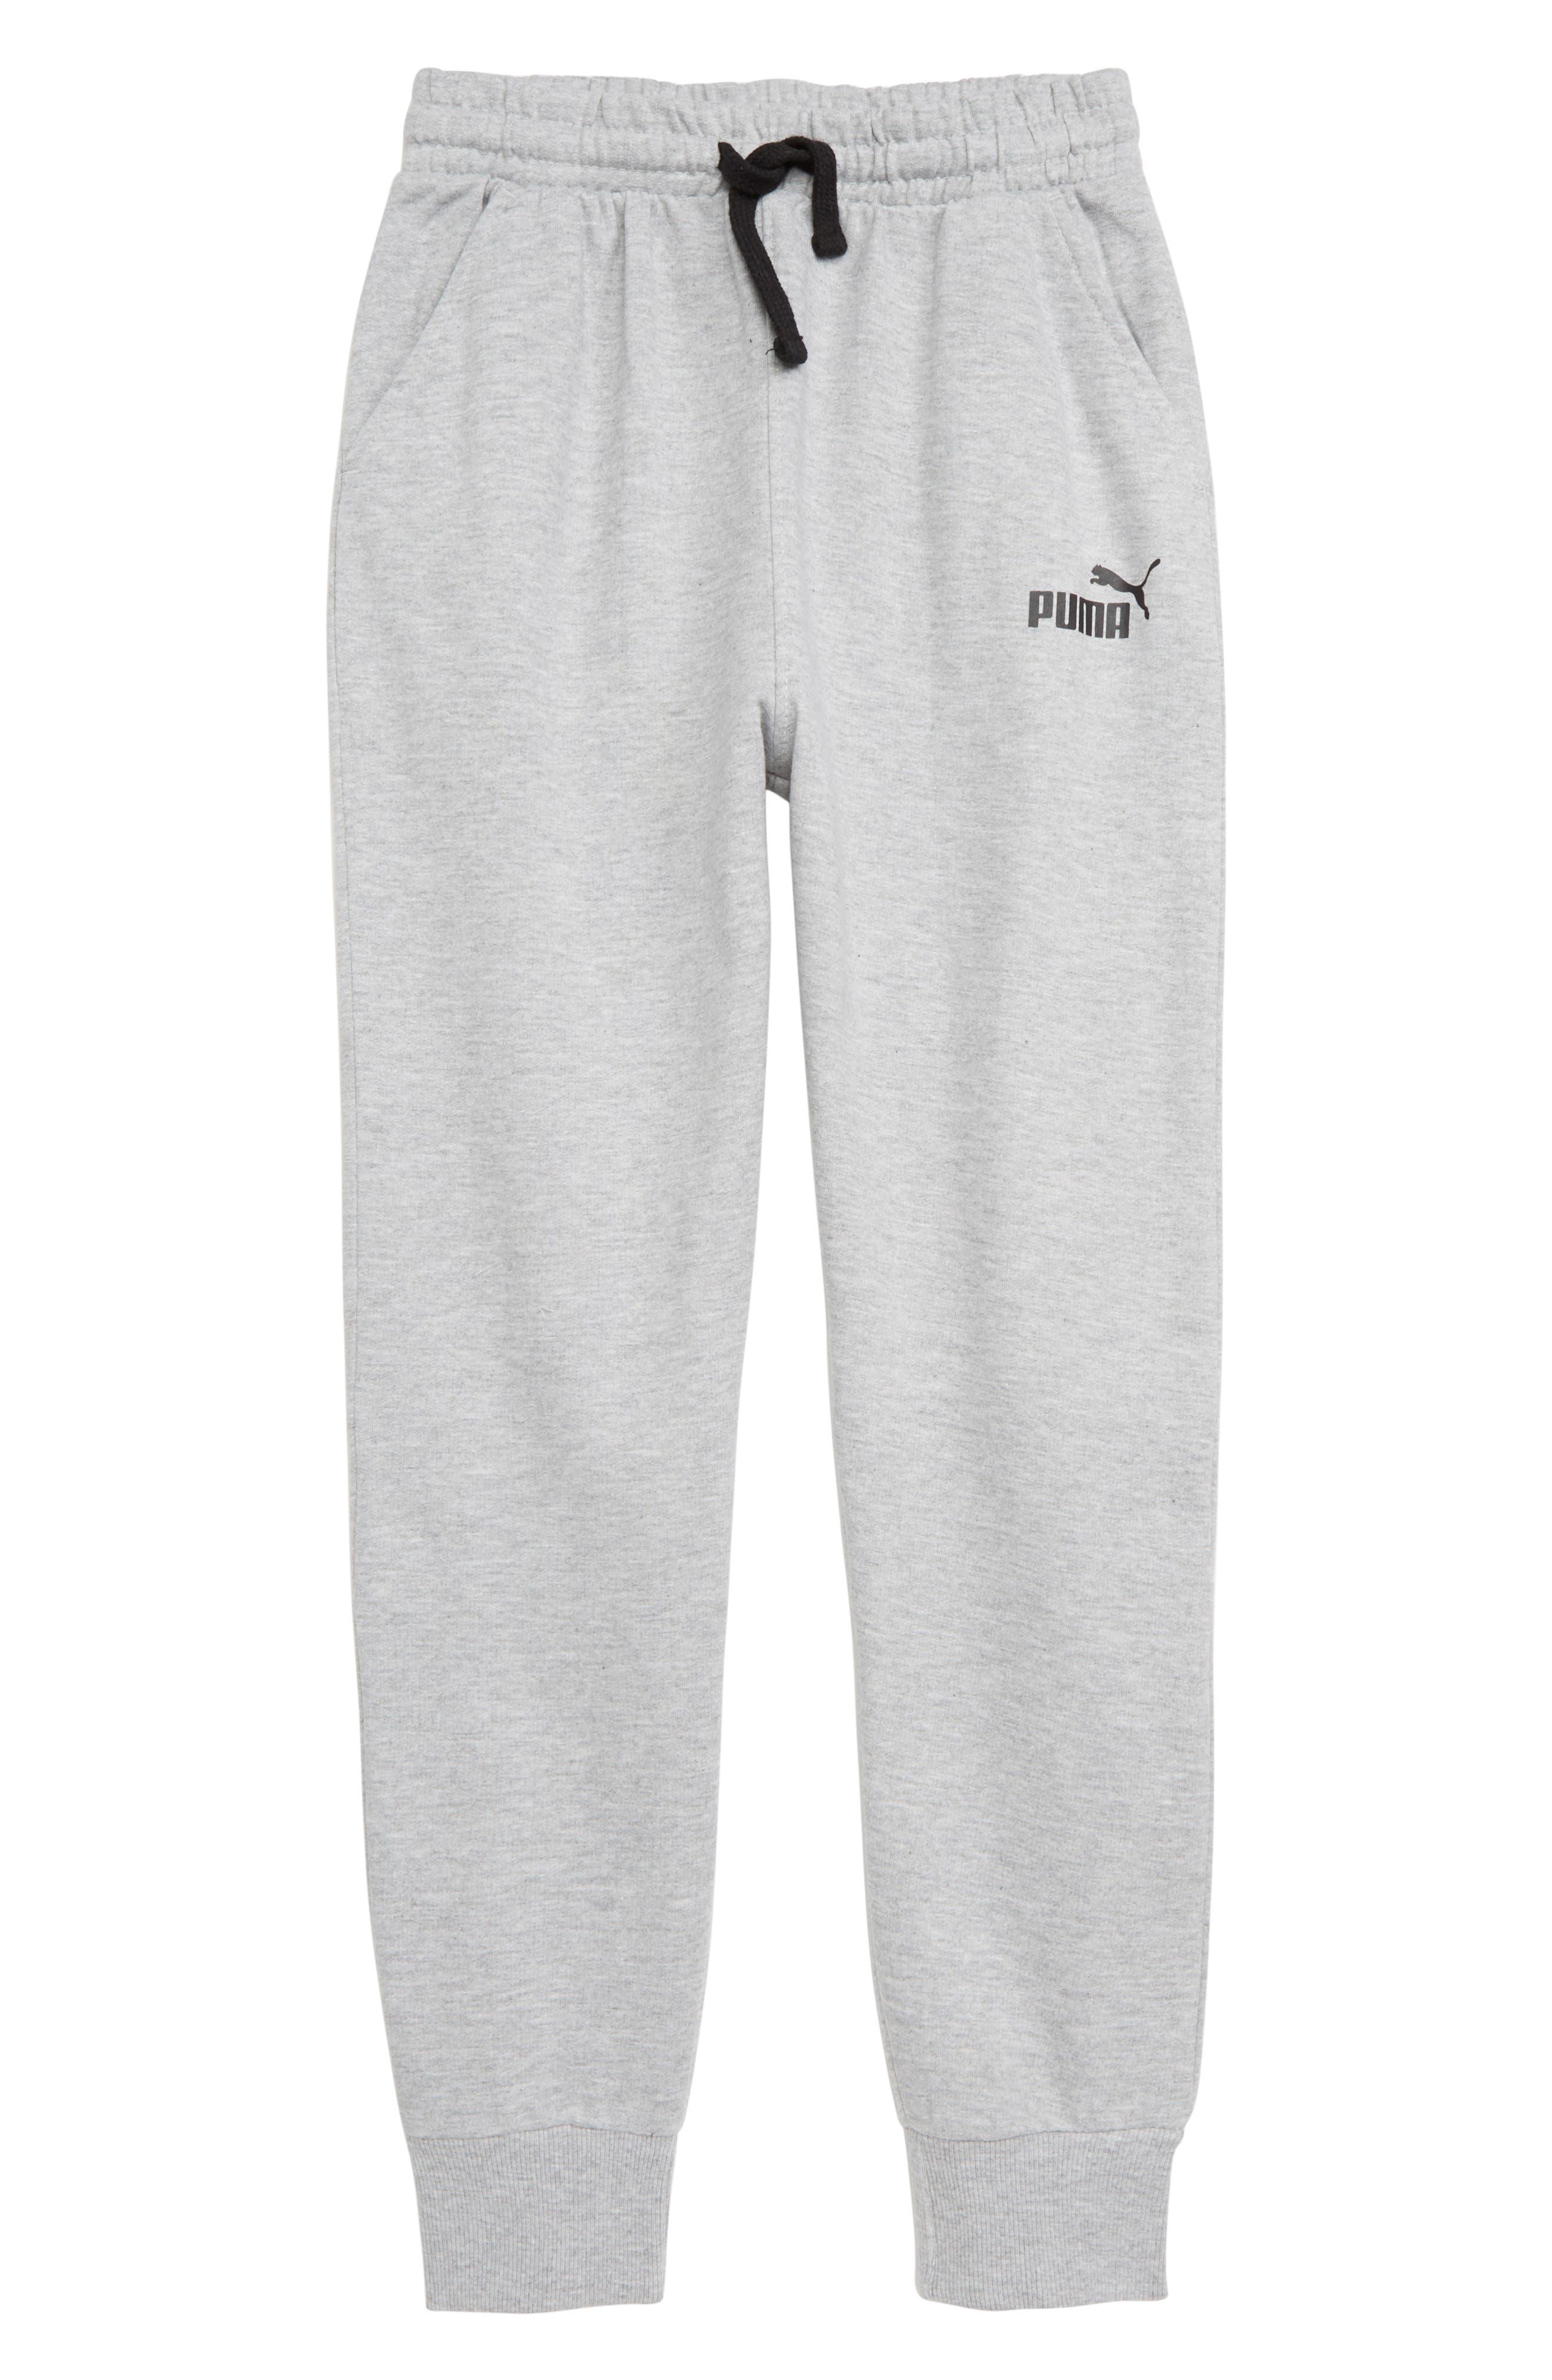 PUMA Fleece Jogger Pants, Main, color, HEATHER GREY